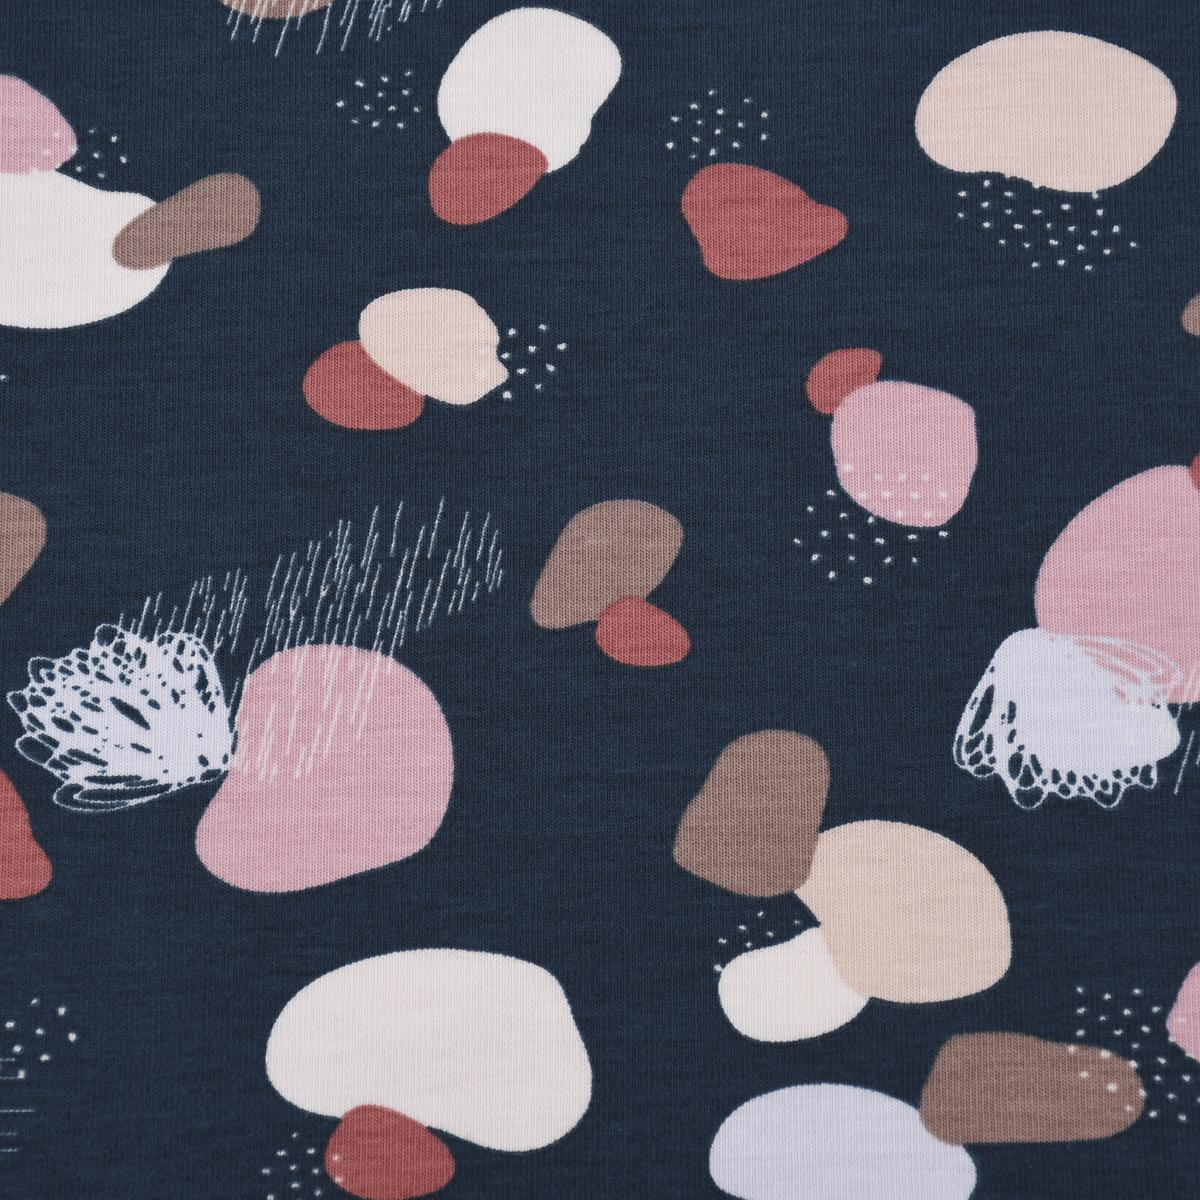 Baumwolljersey Jersey PEBBLES Punkte Tupfen dunkelblau rosa hellblau 1,45m Breite